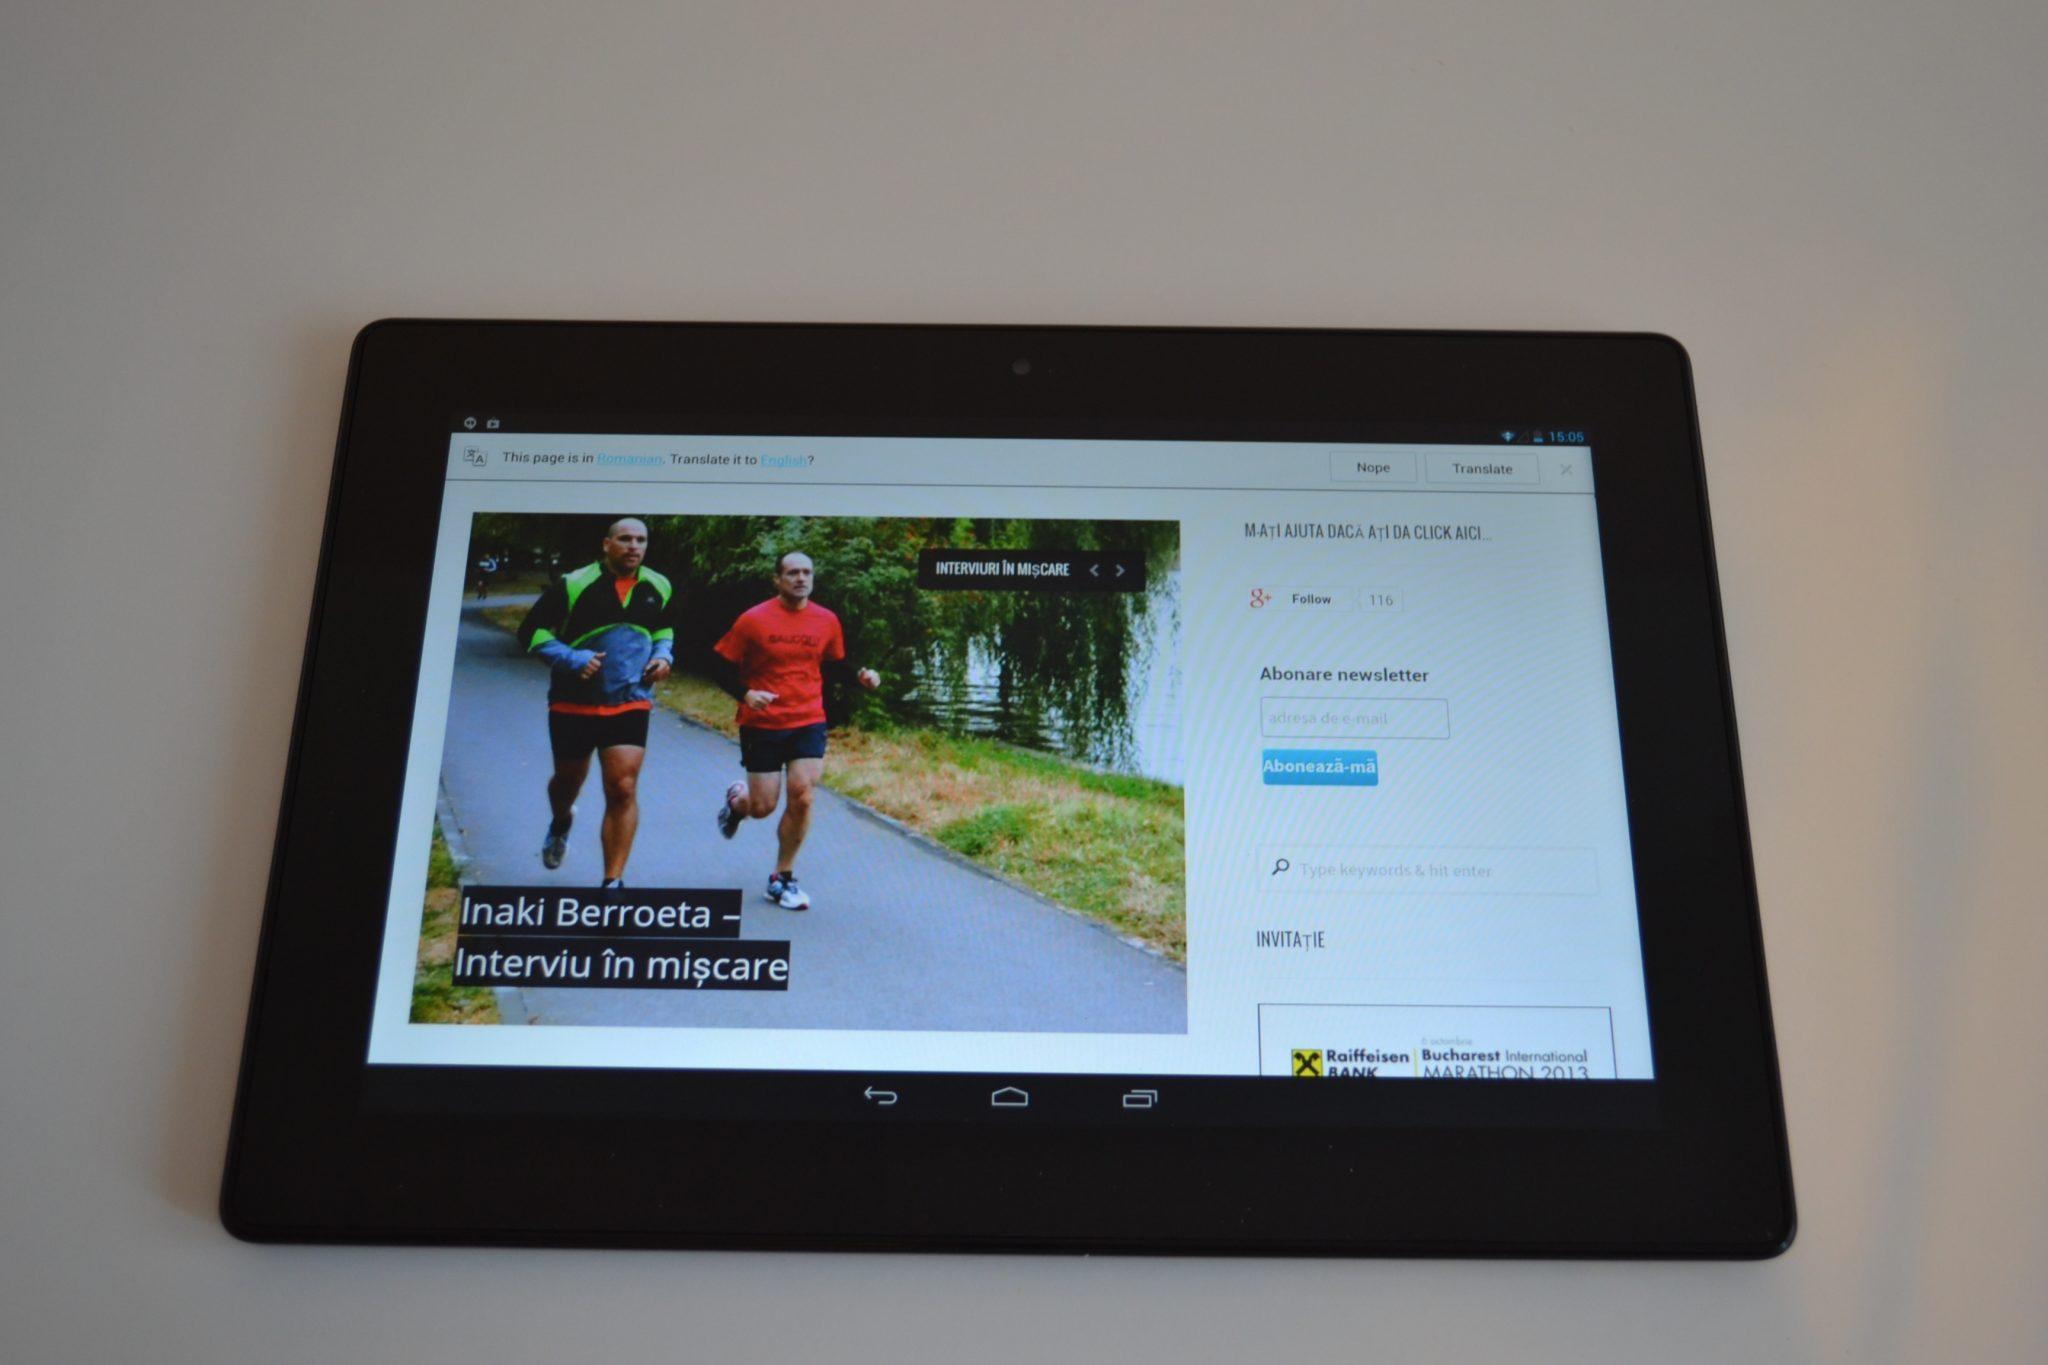 Vodafone Smart Tab III 10 - Biciclistul.ro